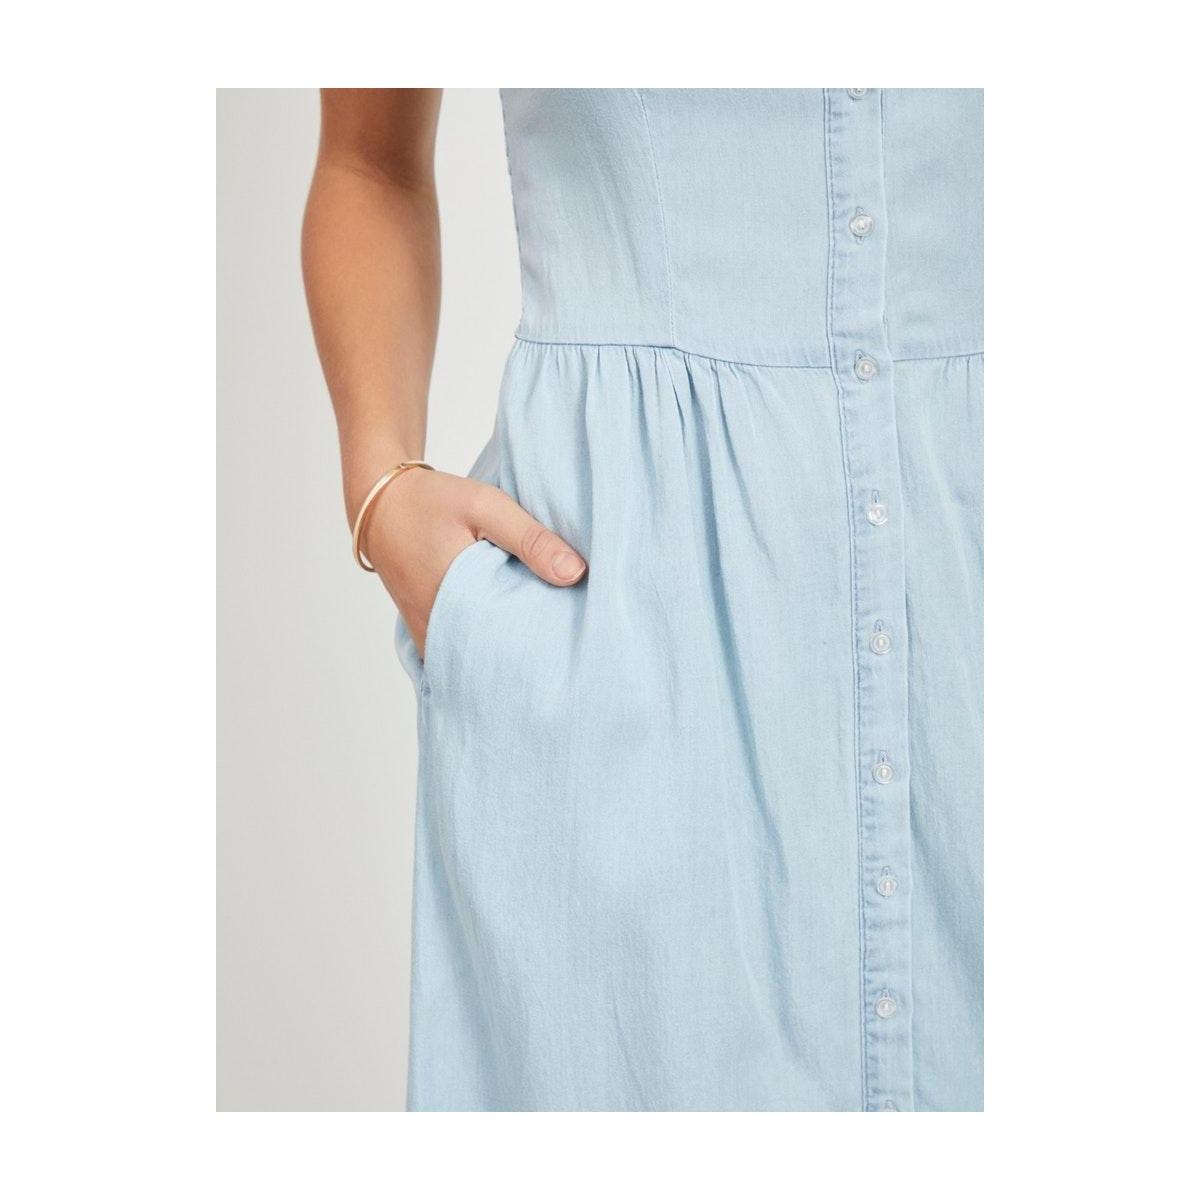 vibista strap midi dress/su/ki 14056659 vila jurk light blue denim